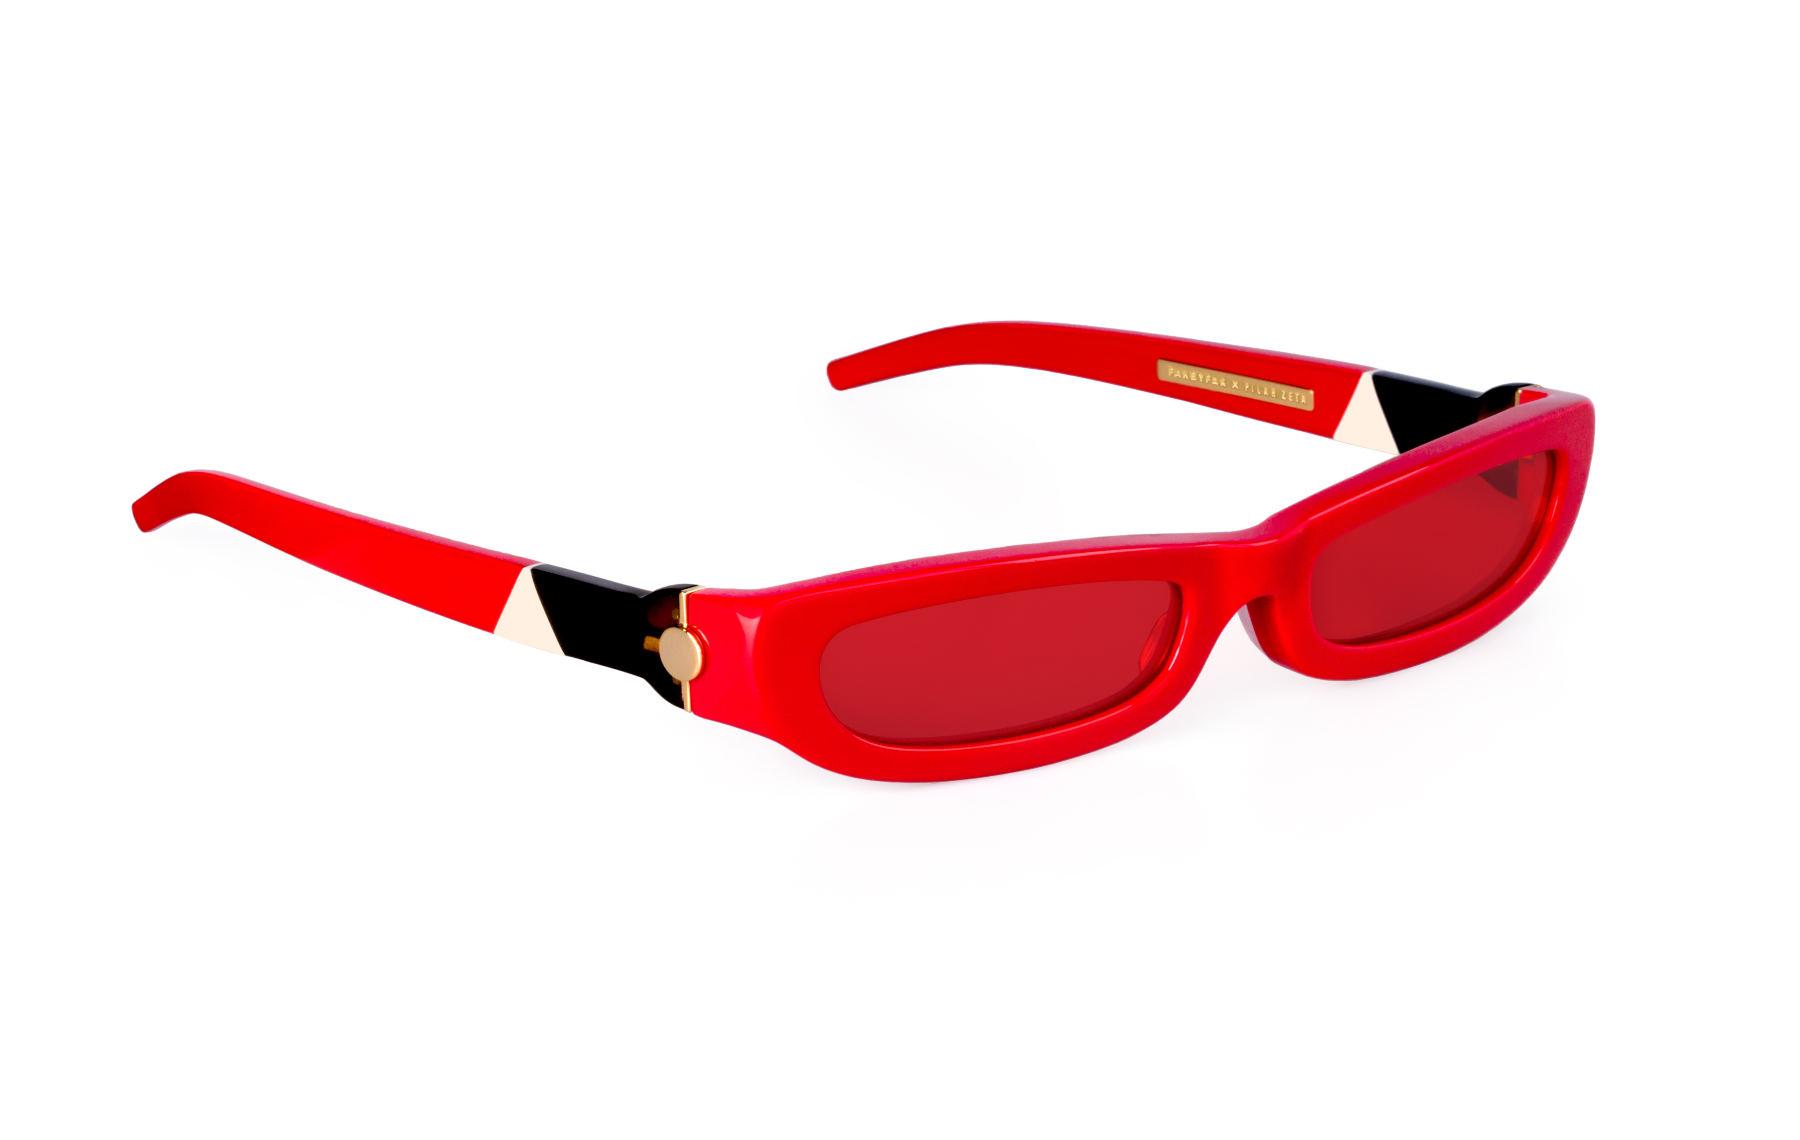 FAKBYFAK x Pilar Zeta  SHARP. Sunglasses. Glossy Red Code: FBF-14-01-06